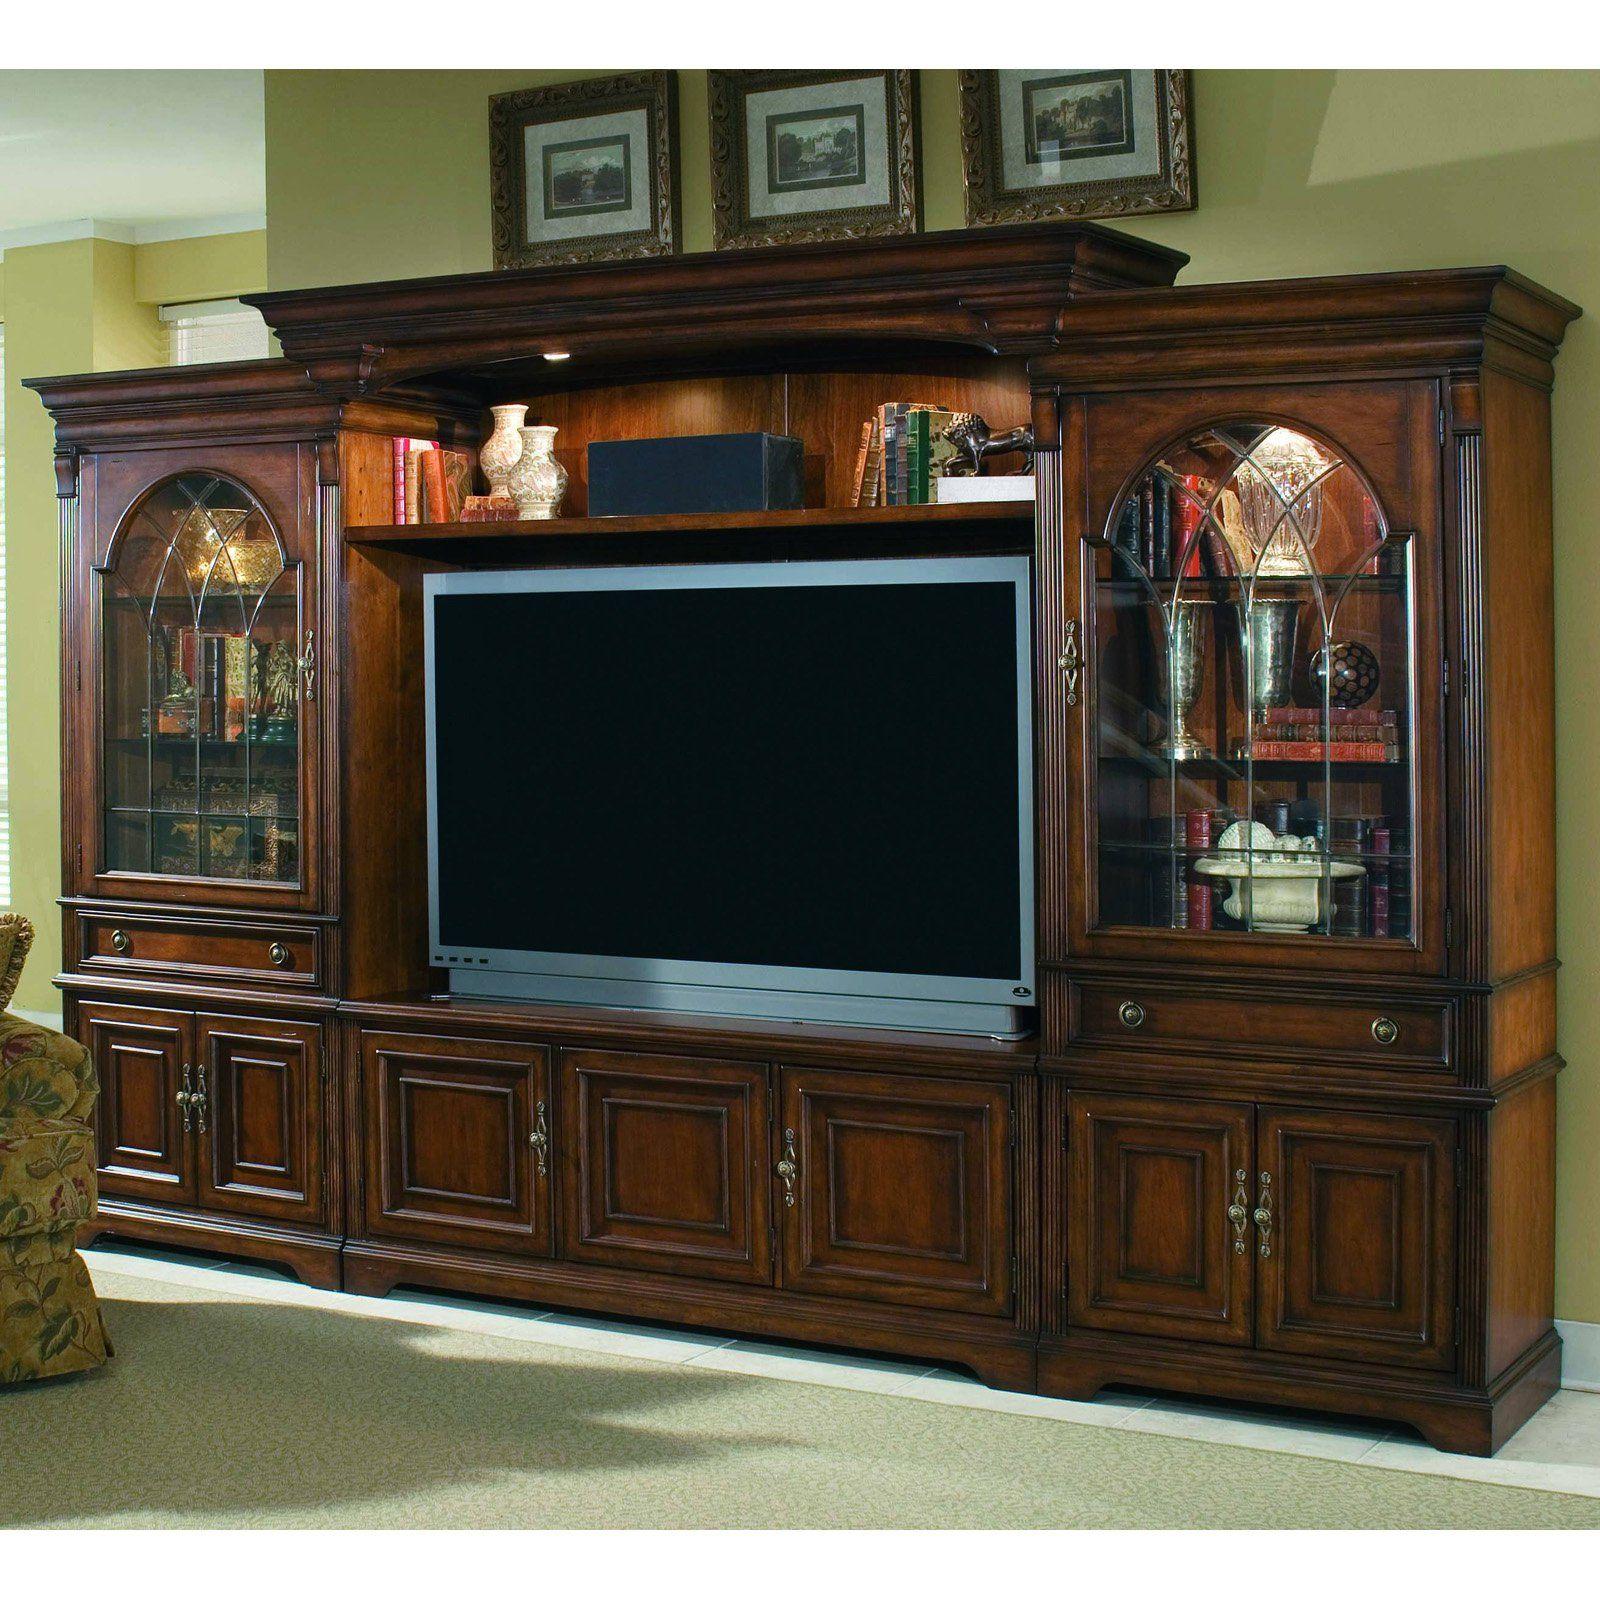 American Furniture Auburn Boulevard: Pin On Products